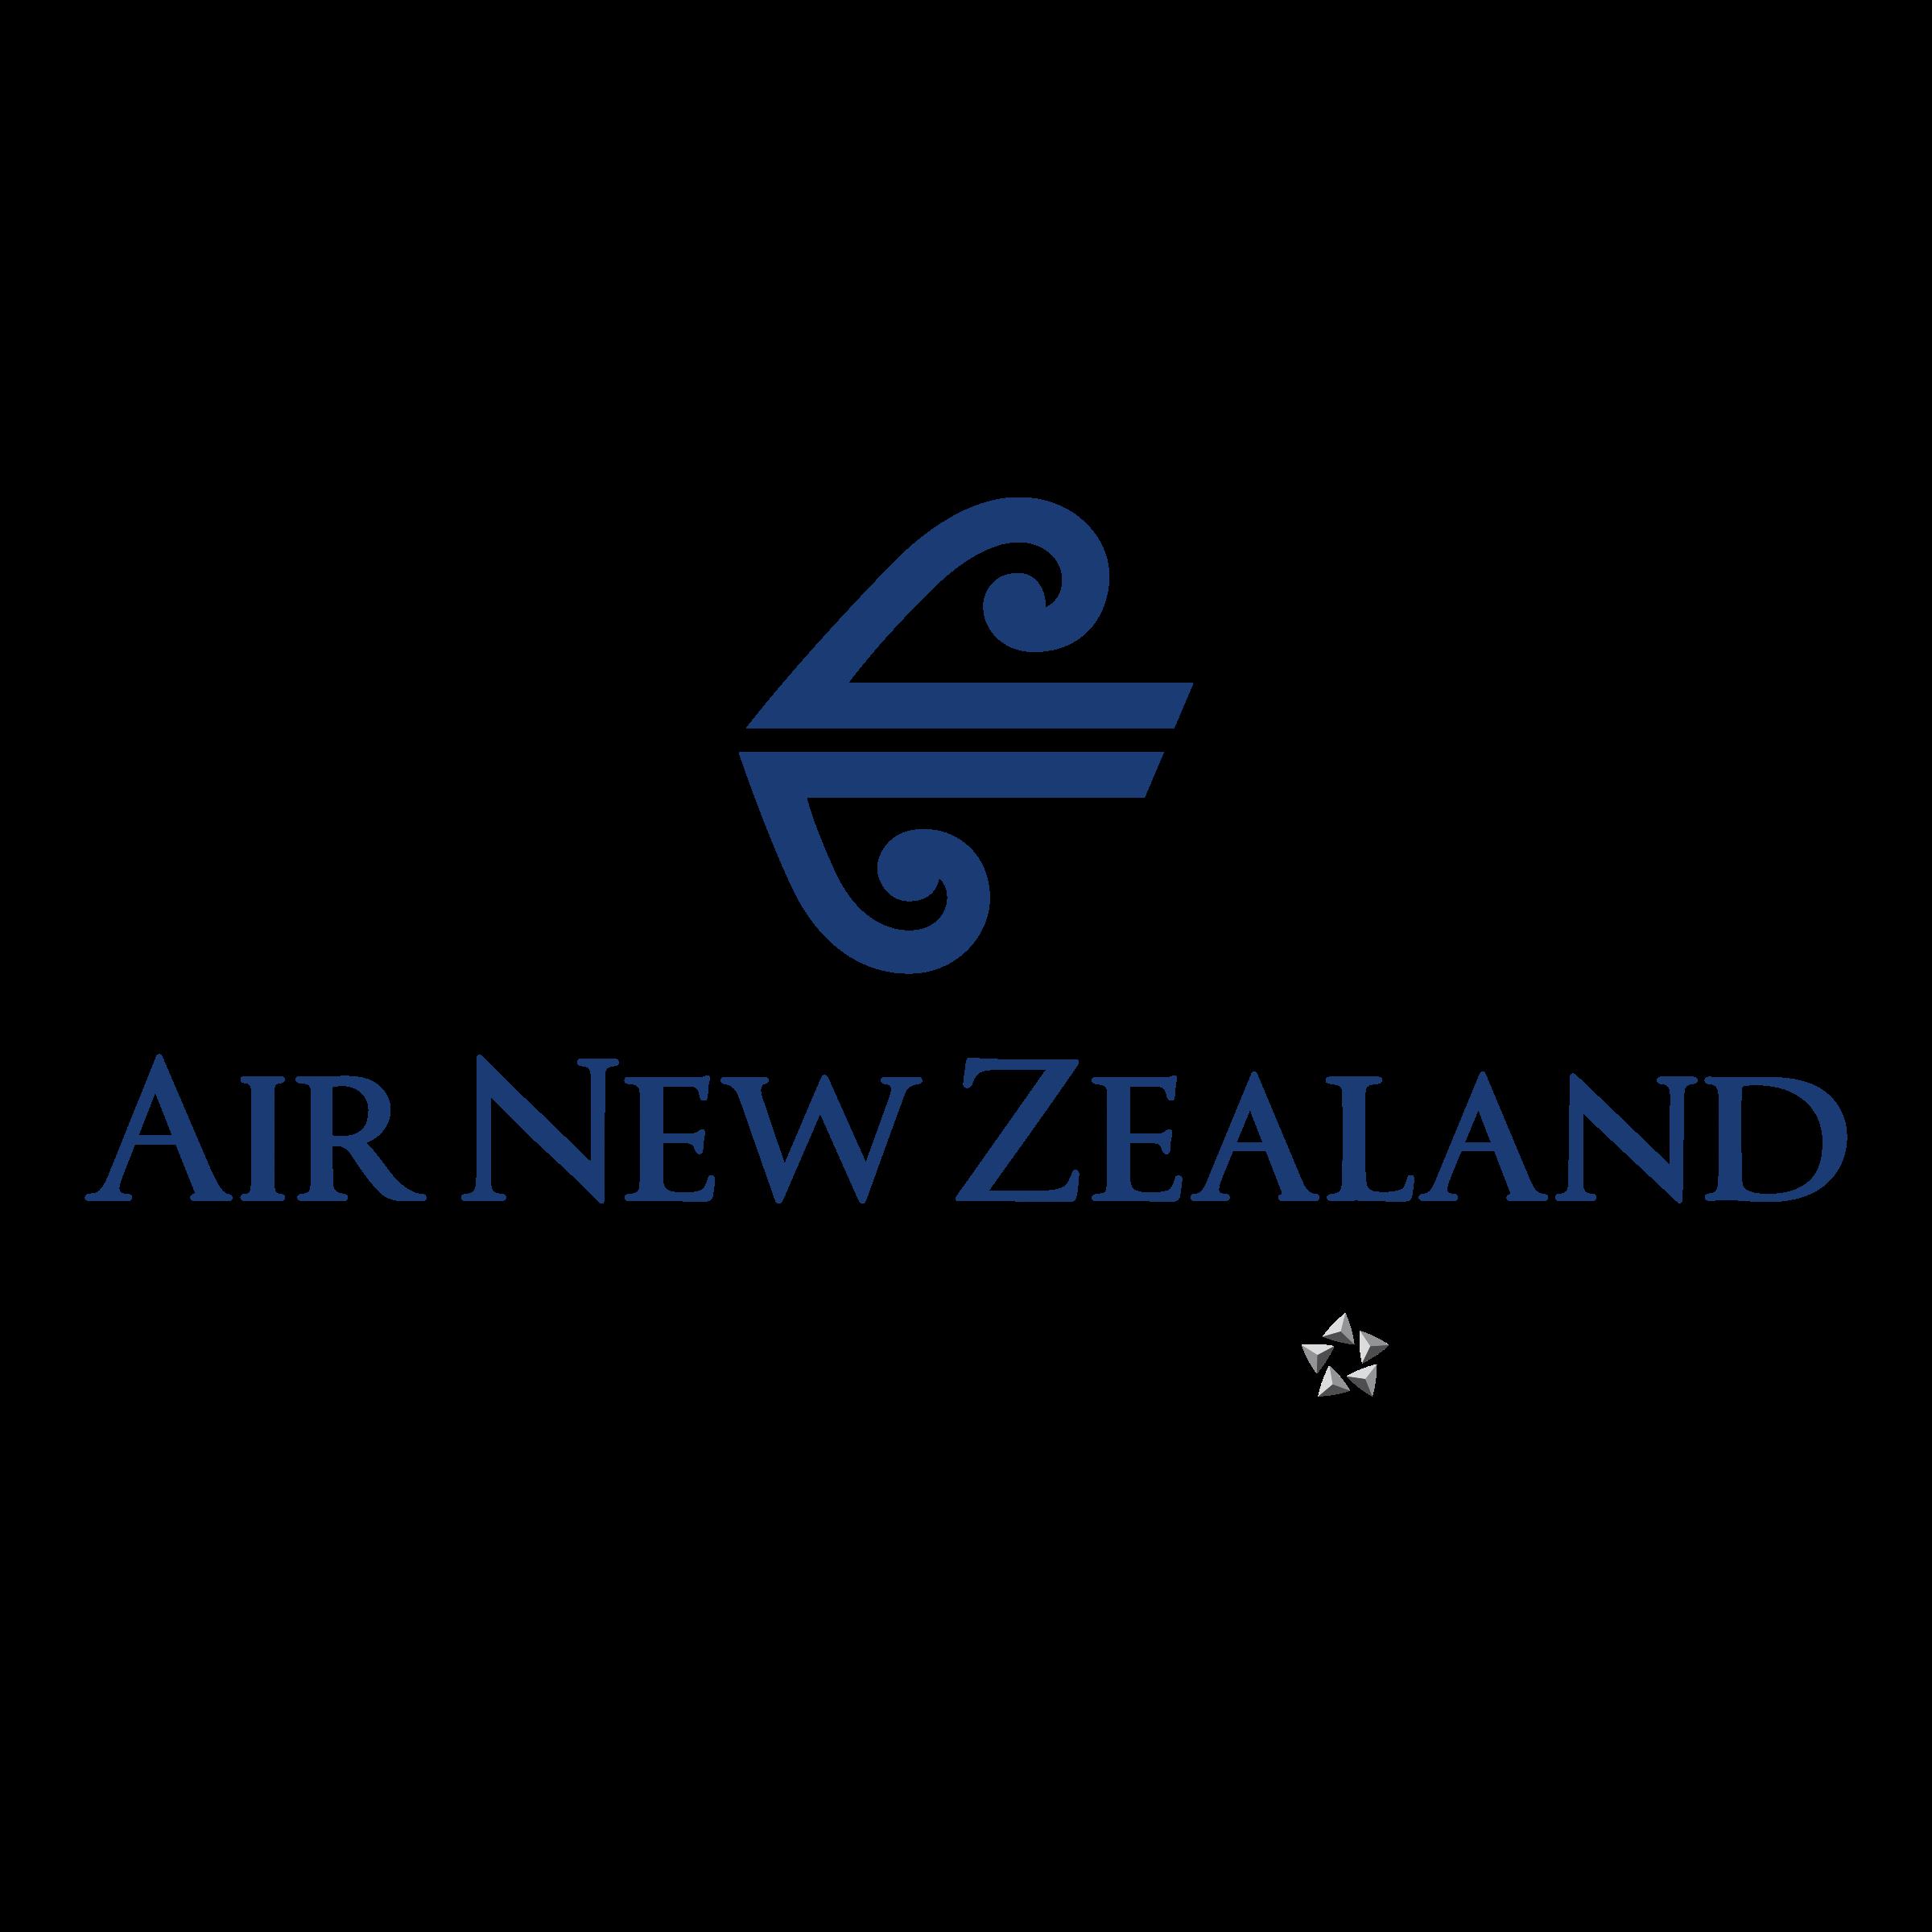 Air New Zealand Logo PNG Transparent & SVG Vector.